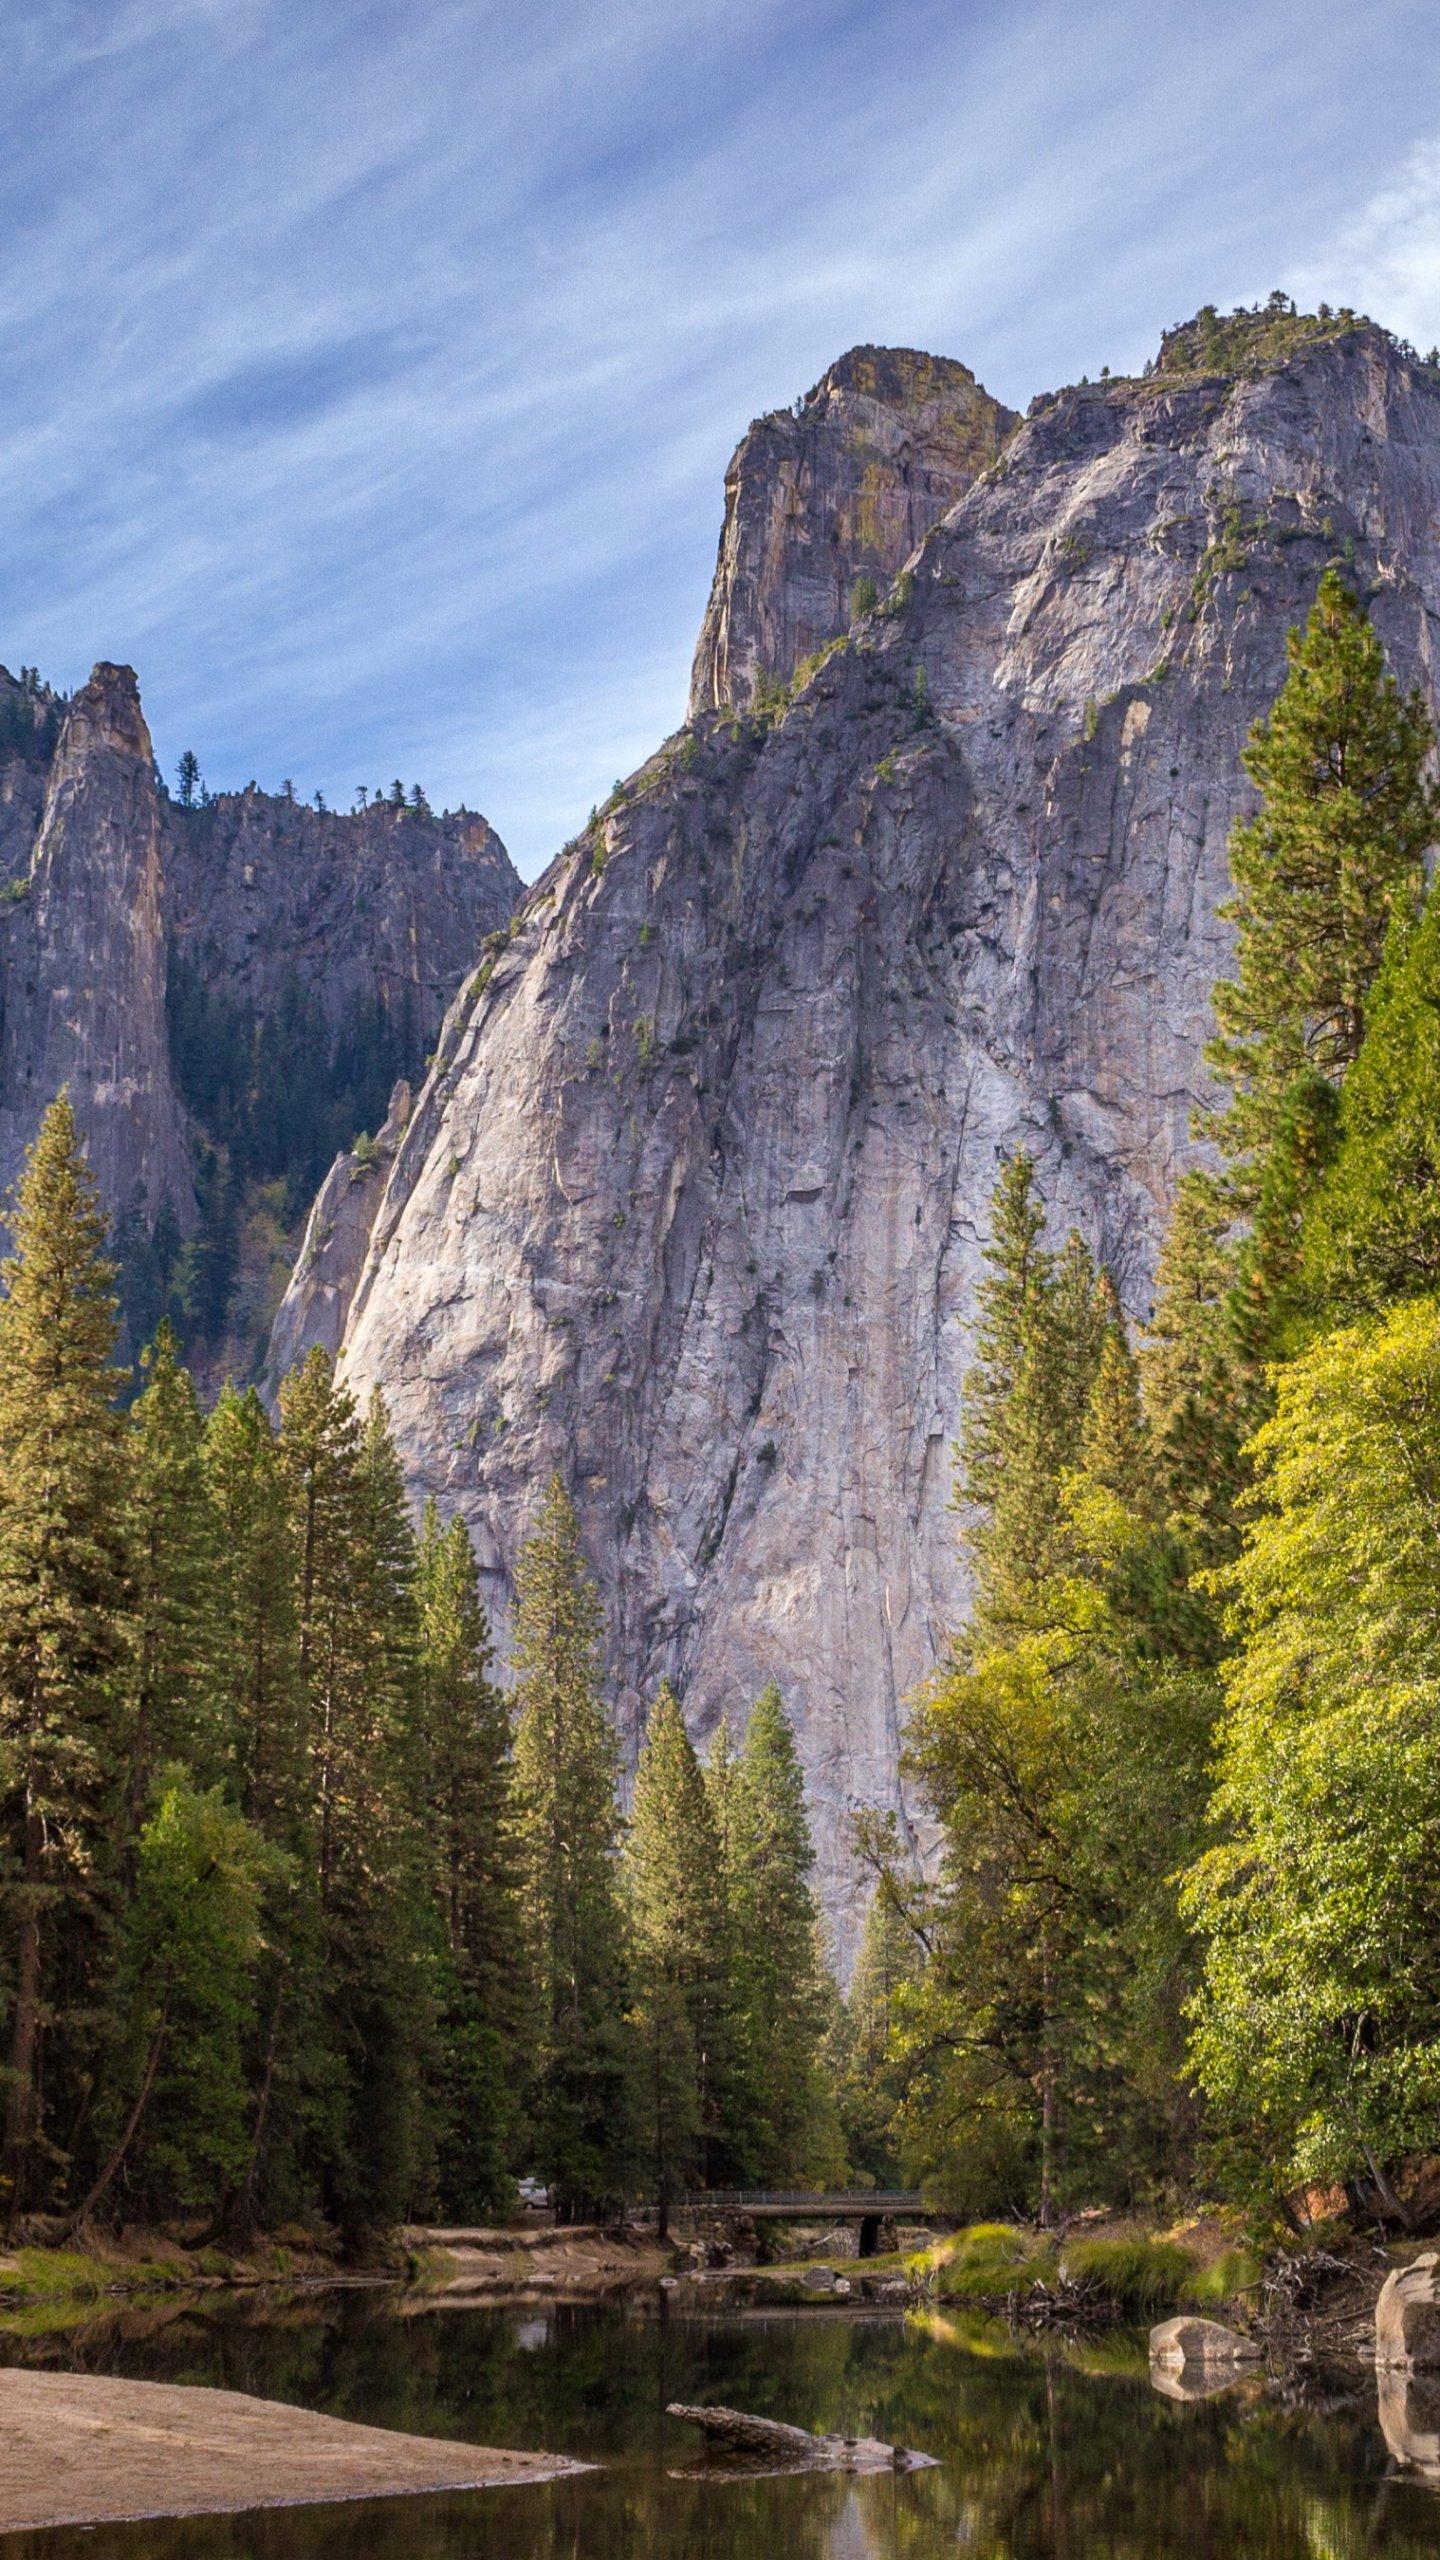 View Iphone Mountain Wallpaper Pics